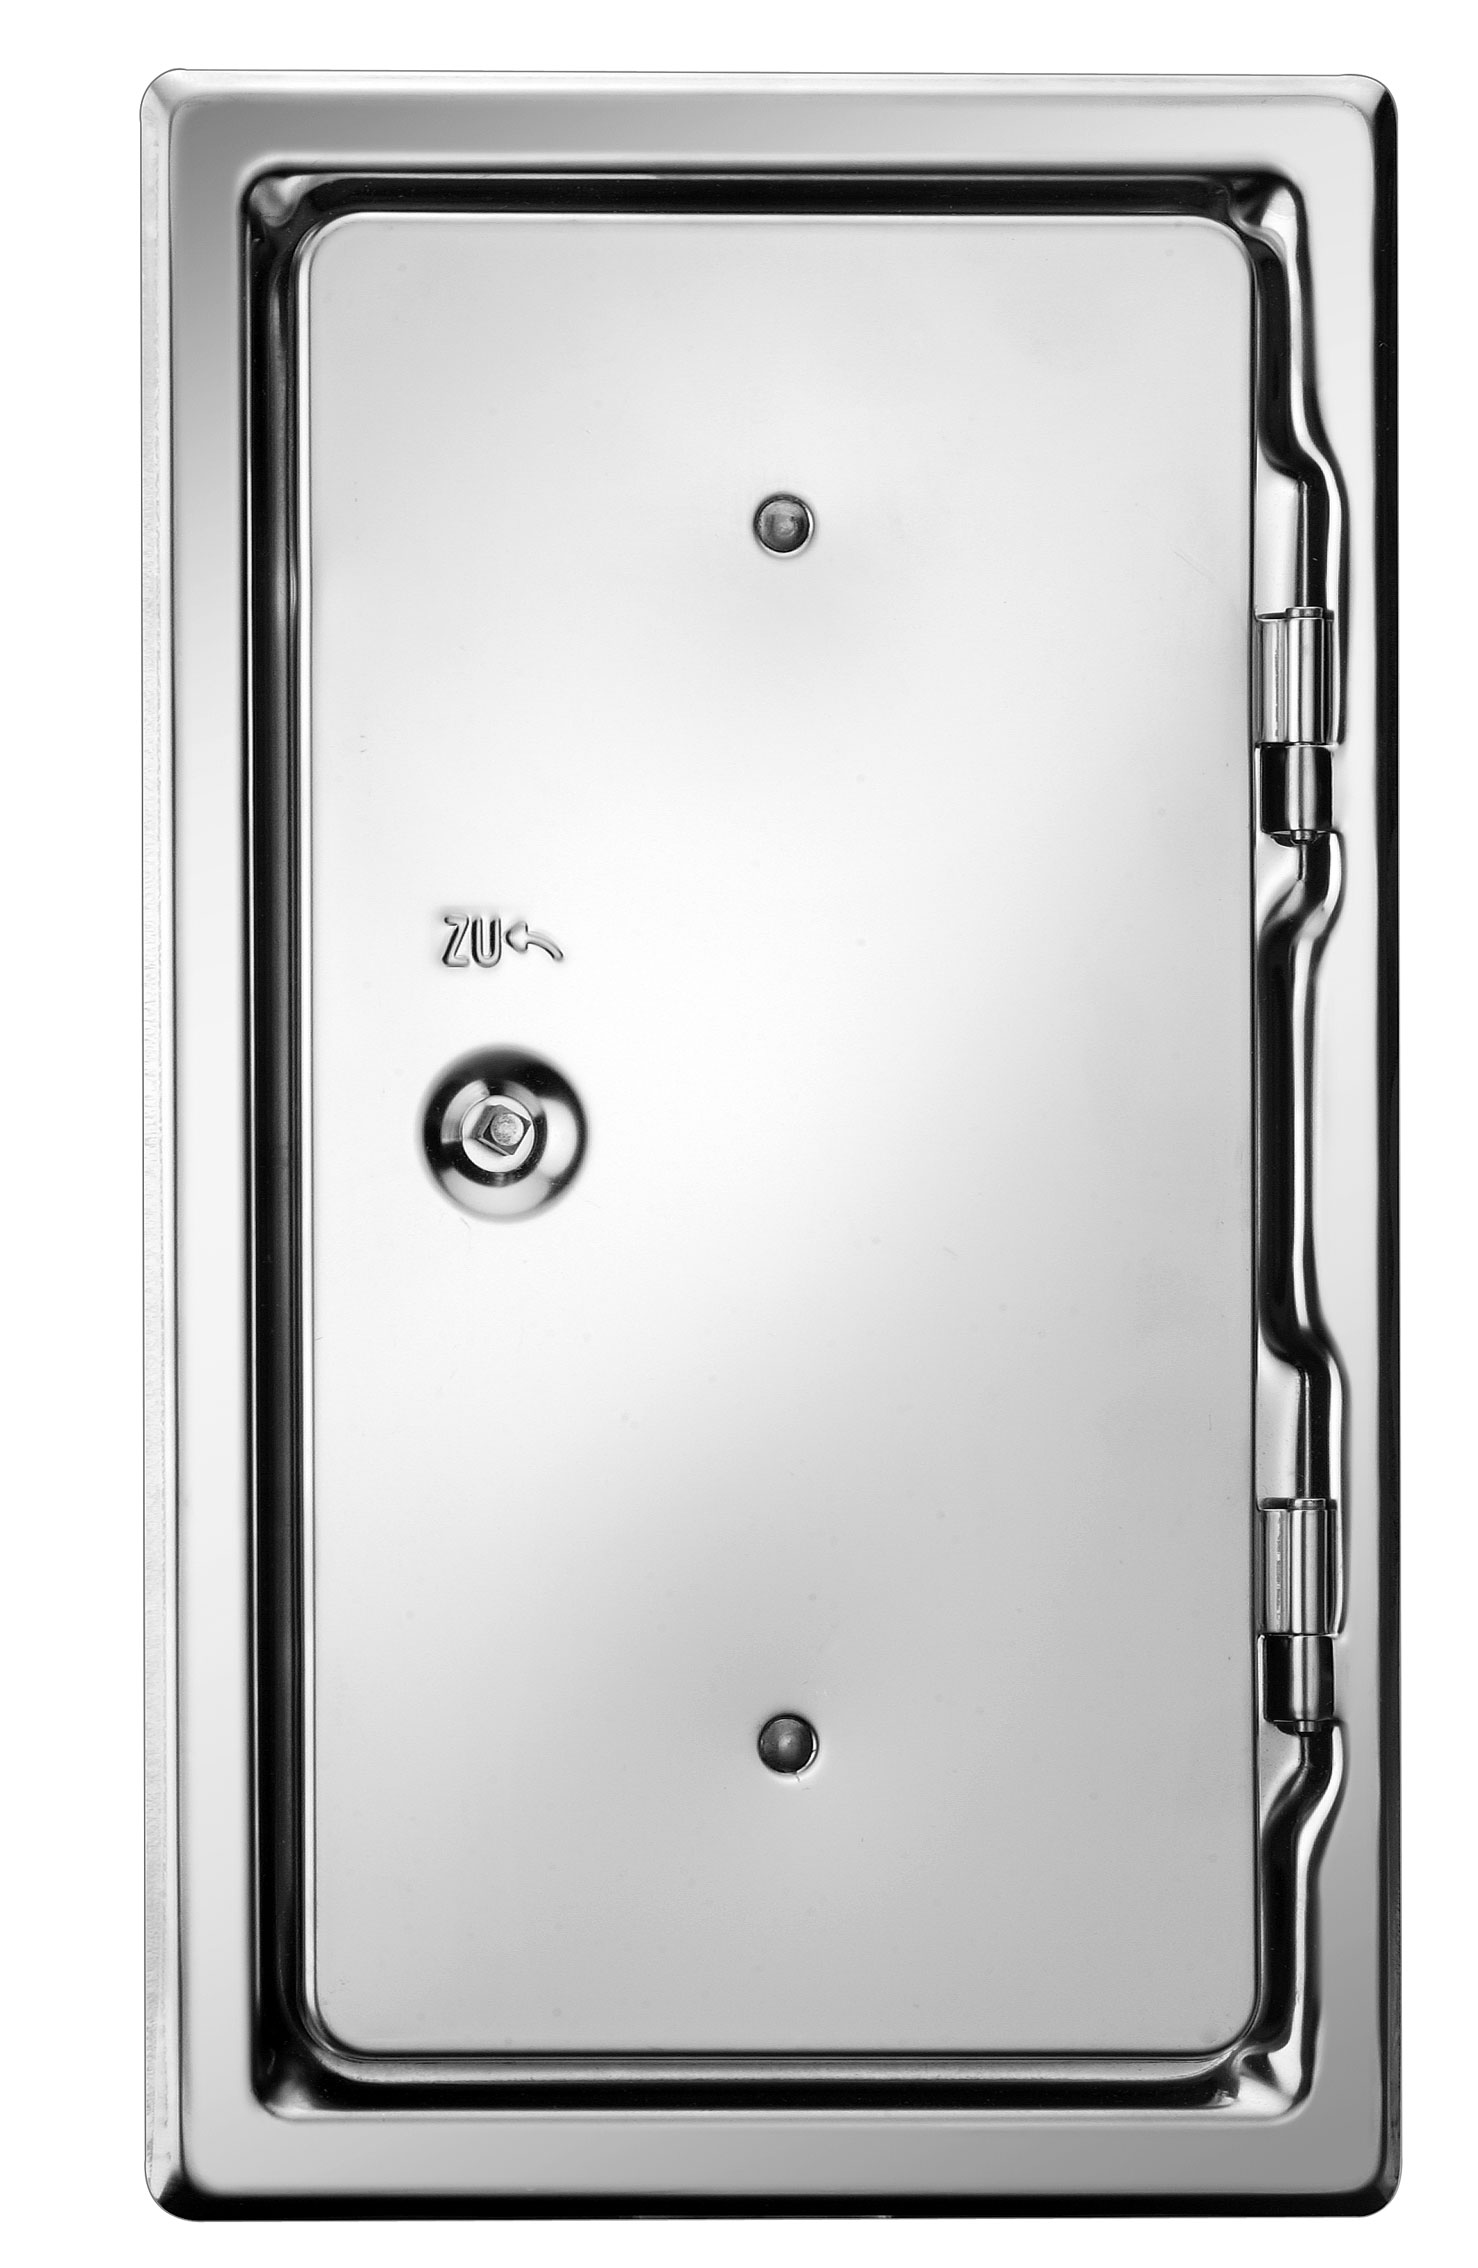 Kamintür K10.24 verzinkt Vierkantverschluss Einbaumaß 100x240mm Bild 1